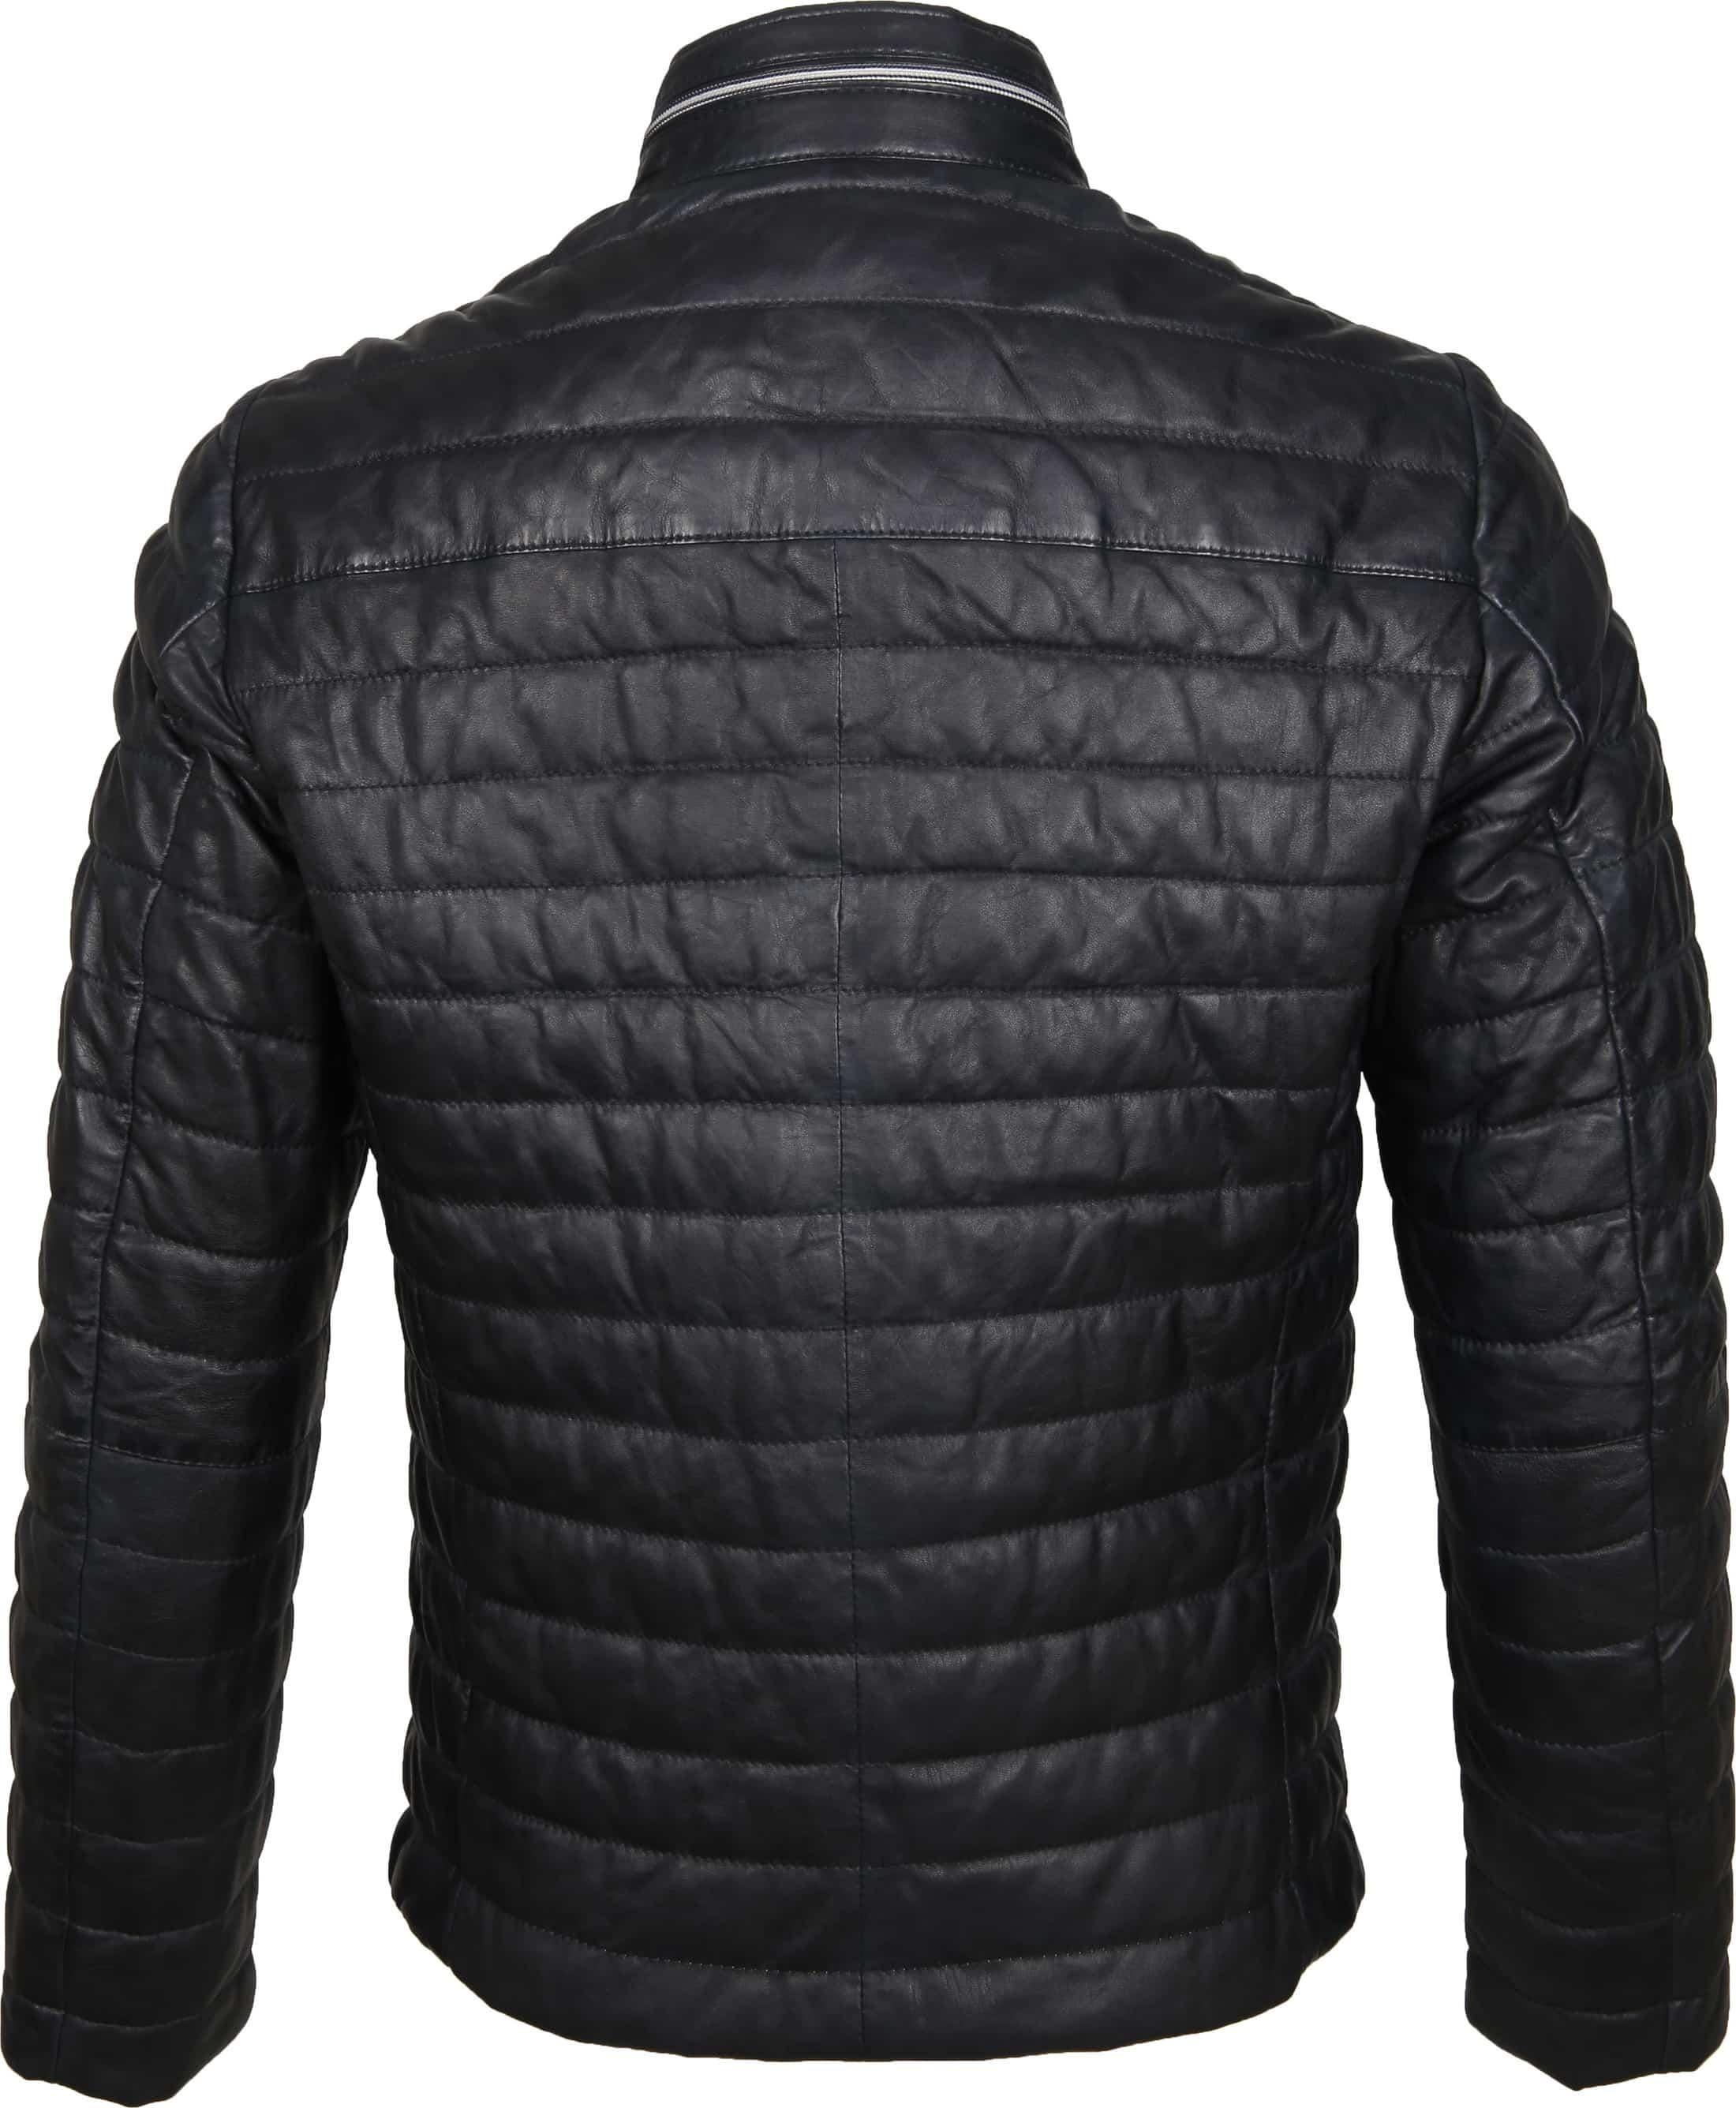 Milestone Tereno Leather Jacket Navy Grey foto 5